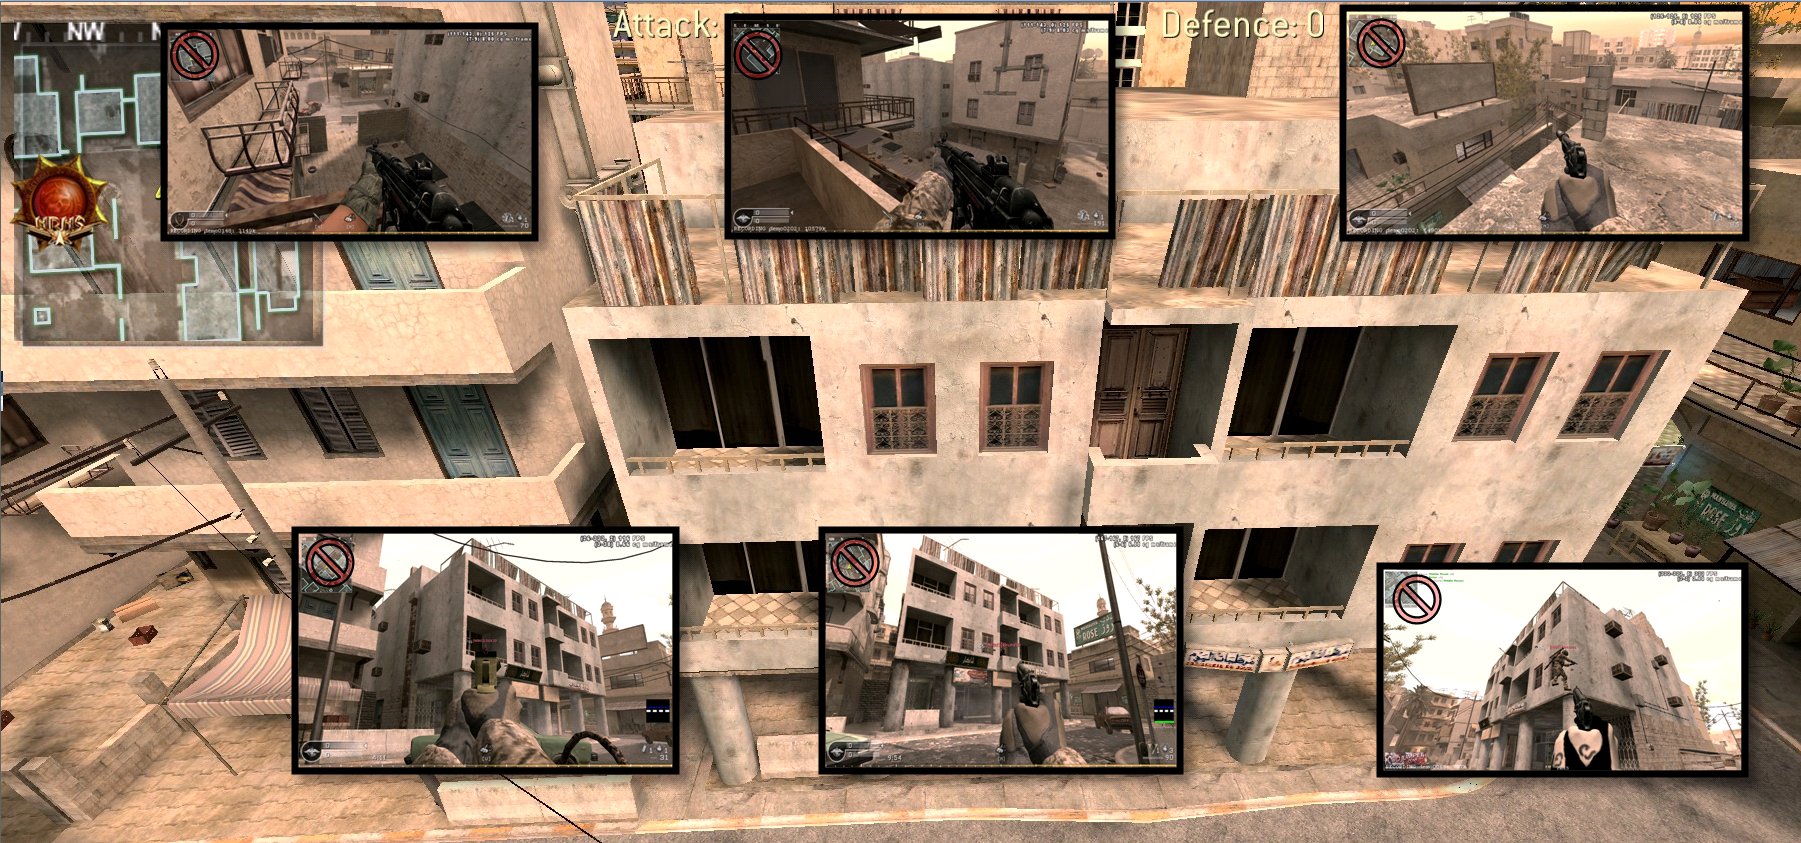 http://nrns-games.com/gallery/27551_29_11_15_9_58_09.png